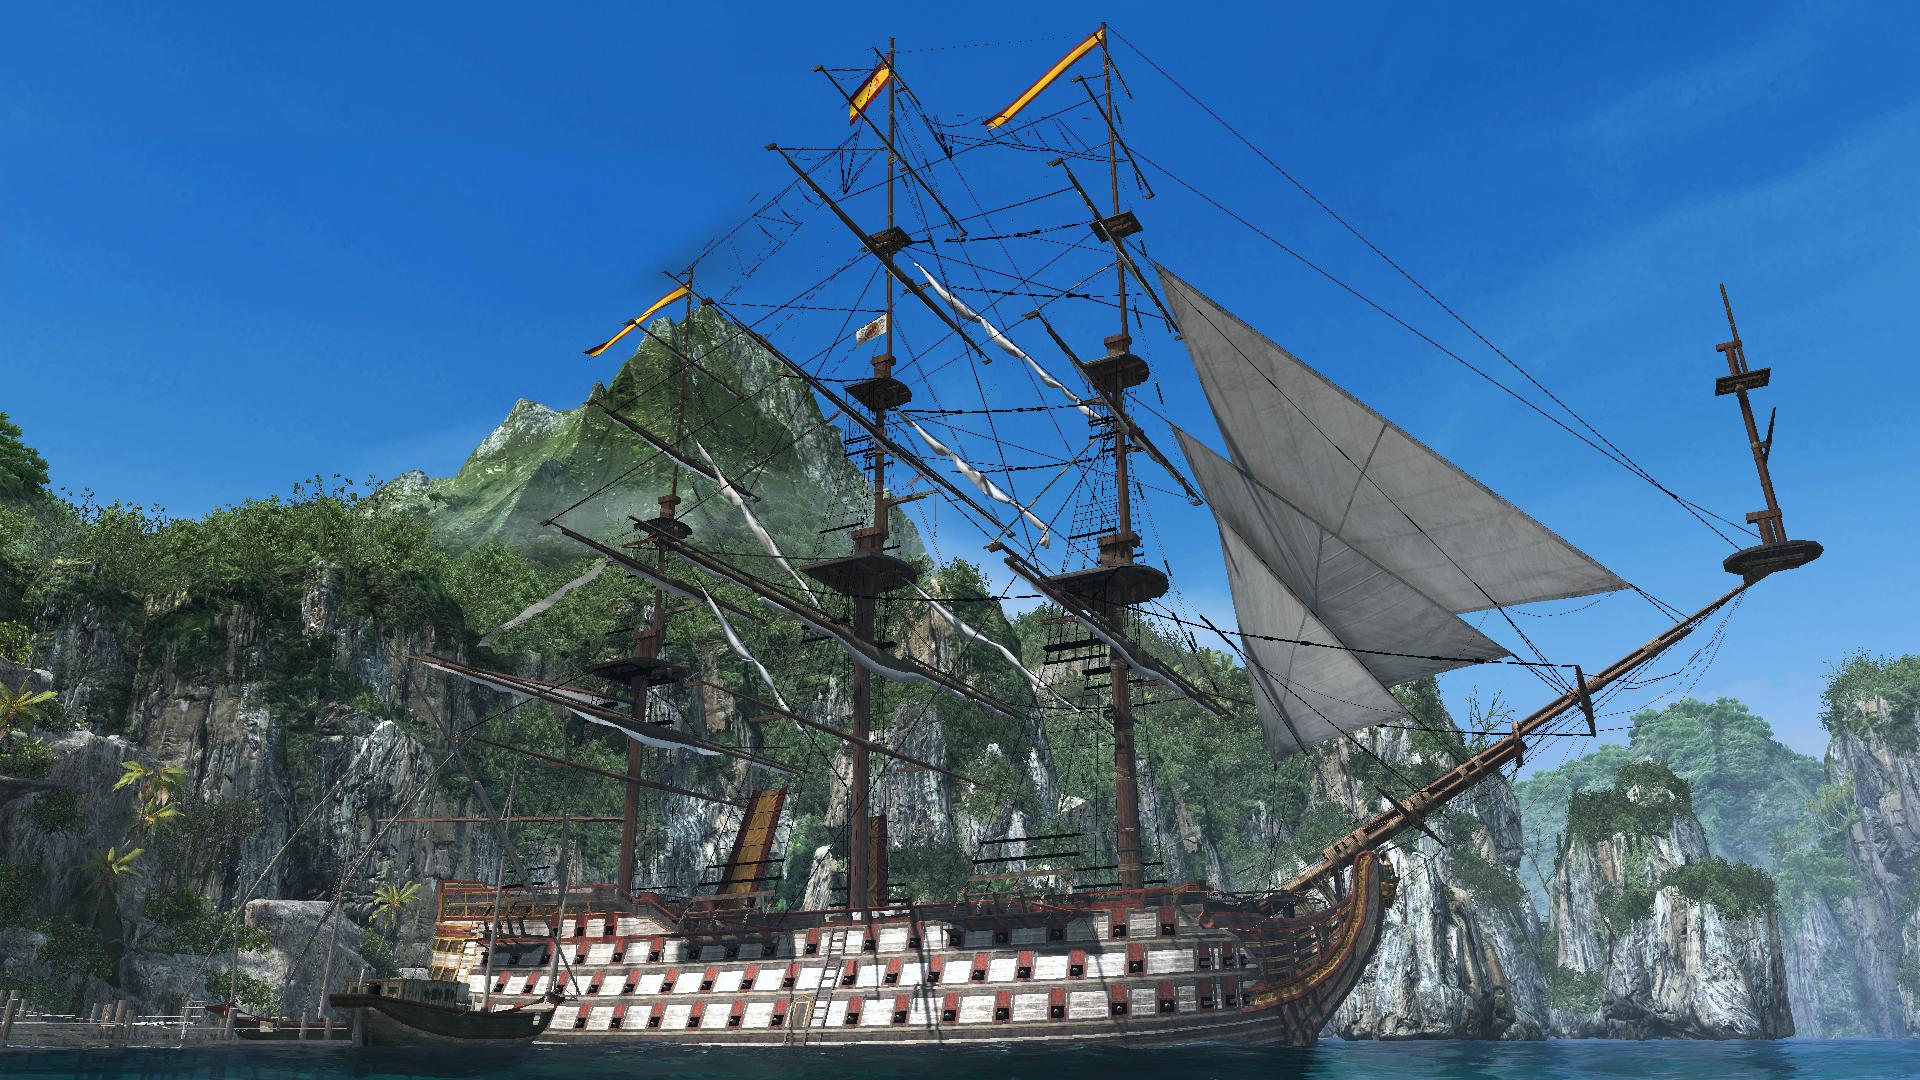 Man O' War | Assassin's Creed Wiki | FANDOM powered by Wikia